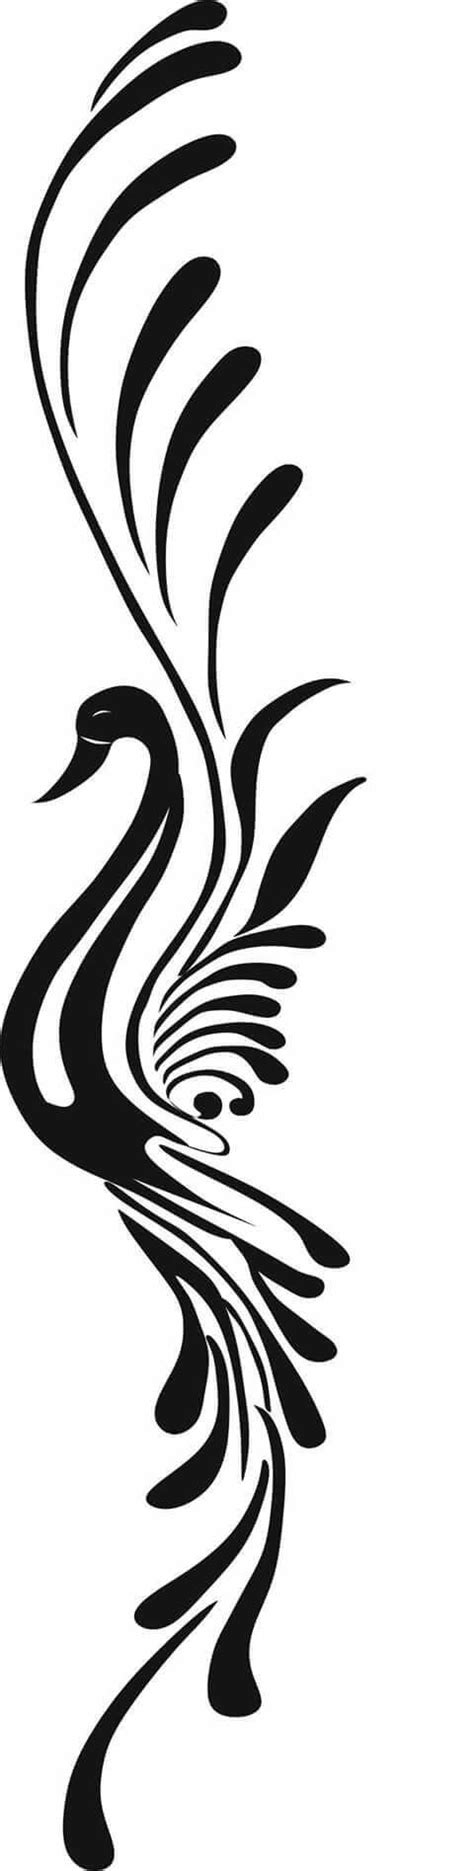 Cutting Sticker Islami Stiker Kaligrafi Alhamdulillah 60cm 17 best images about hat tezhip ebru kaligrafi on